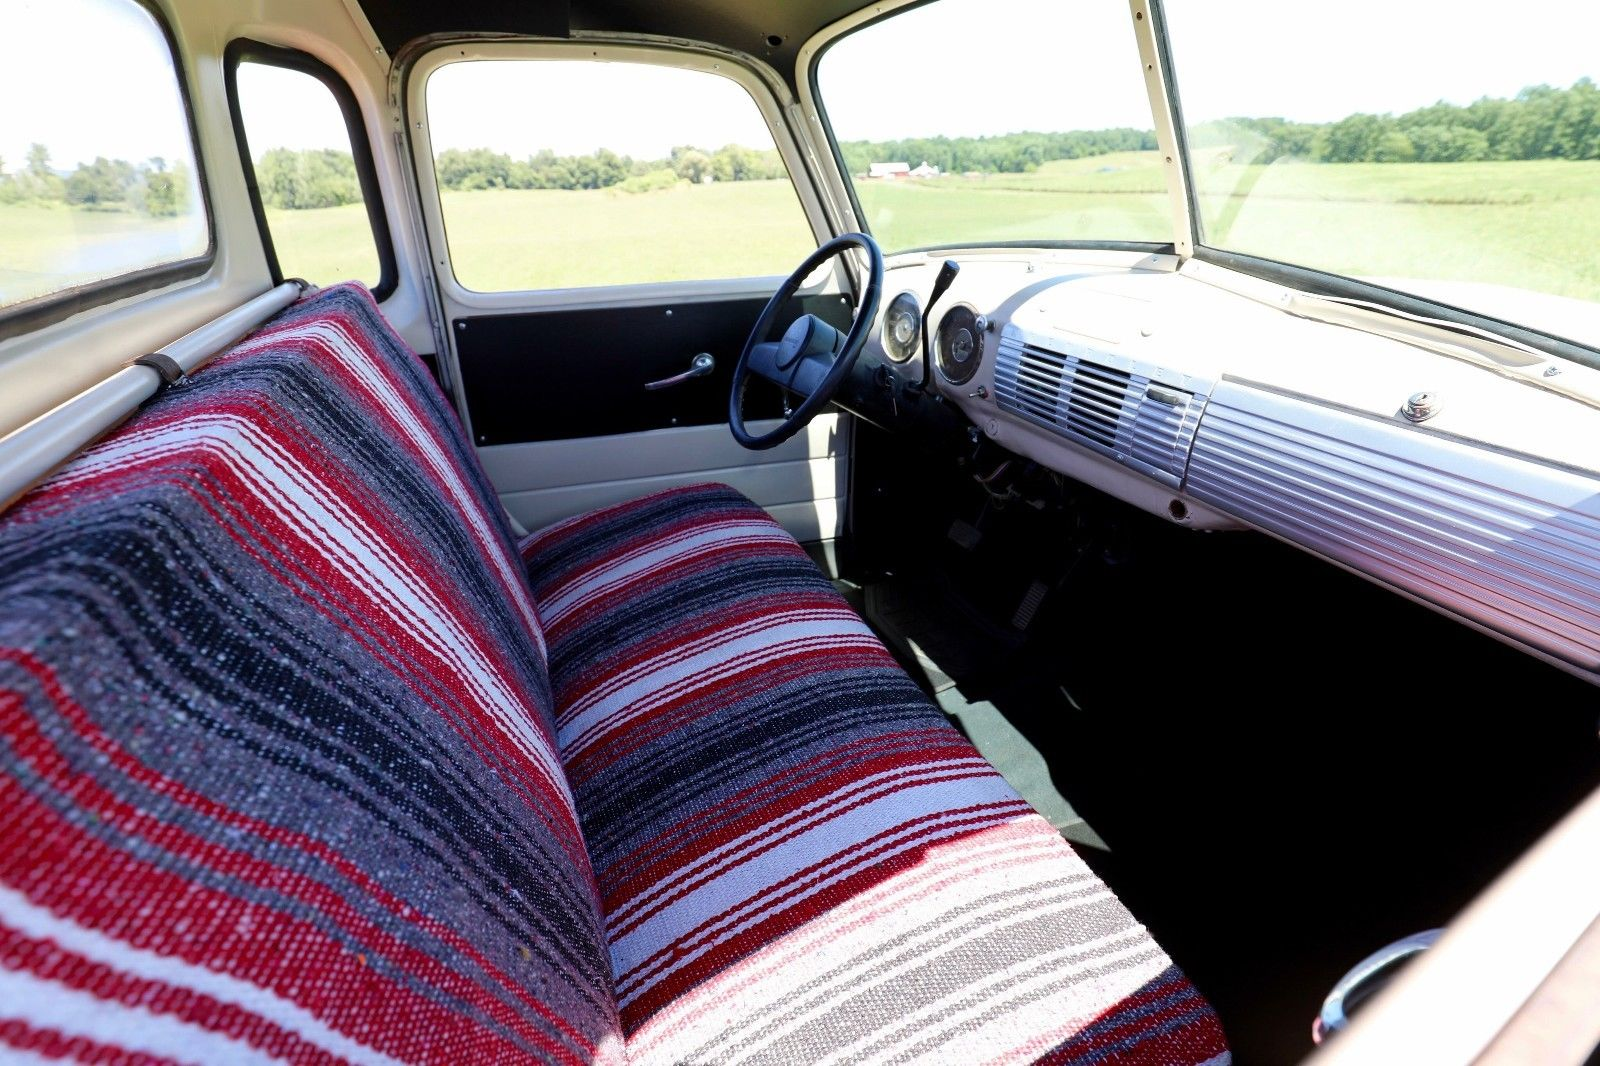 Great 1949 Chevrolet Other Pickups 3100 Chevy Truck Rat Steering Wheel Item Specifics